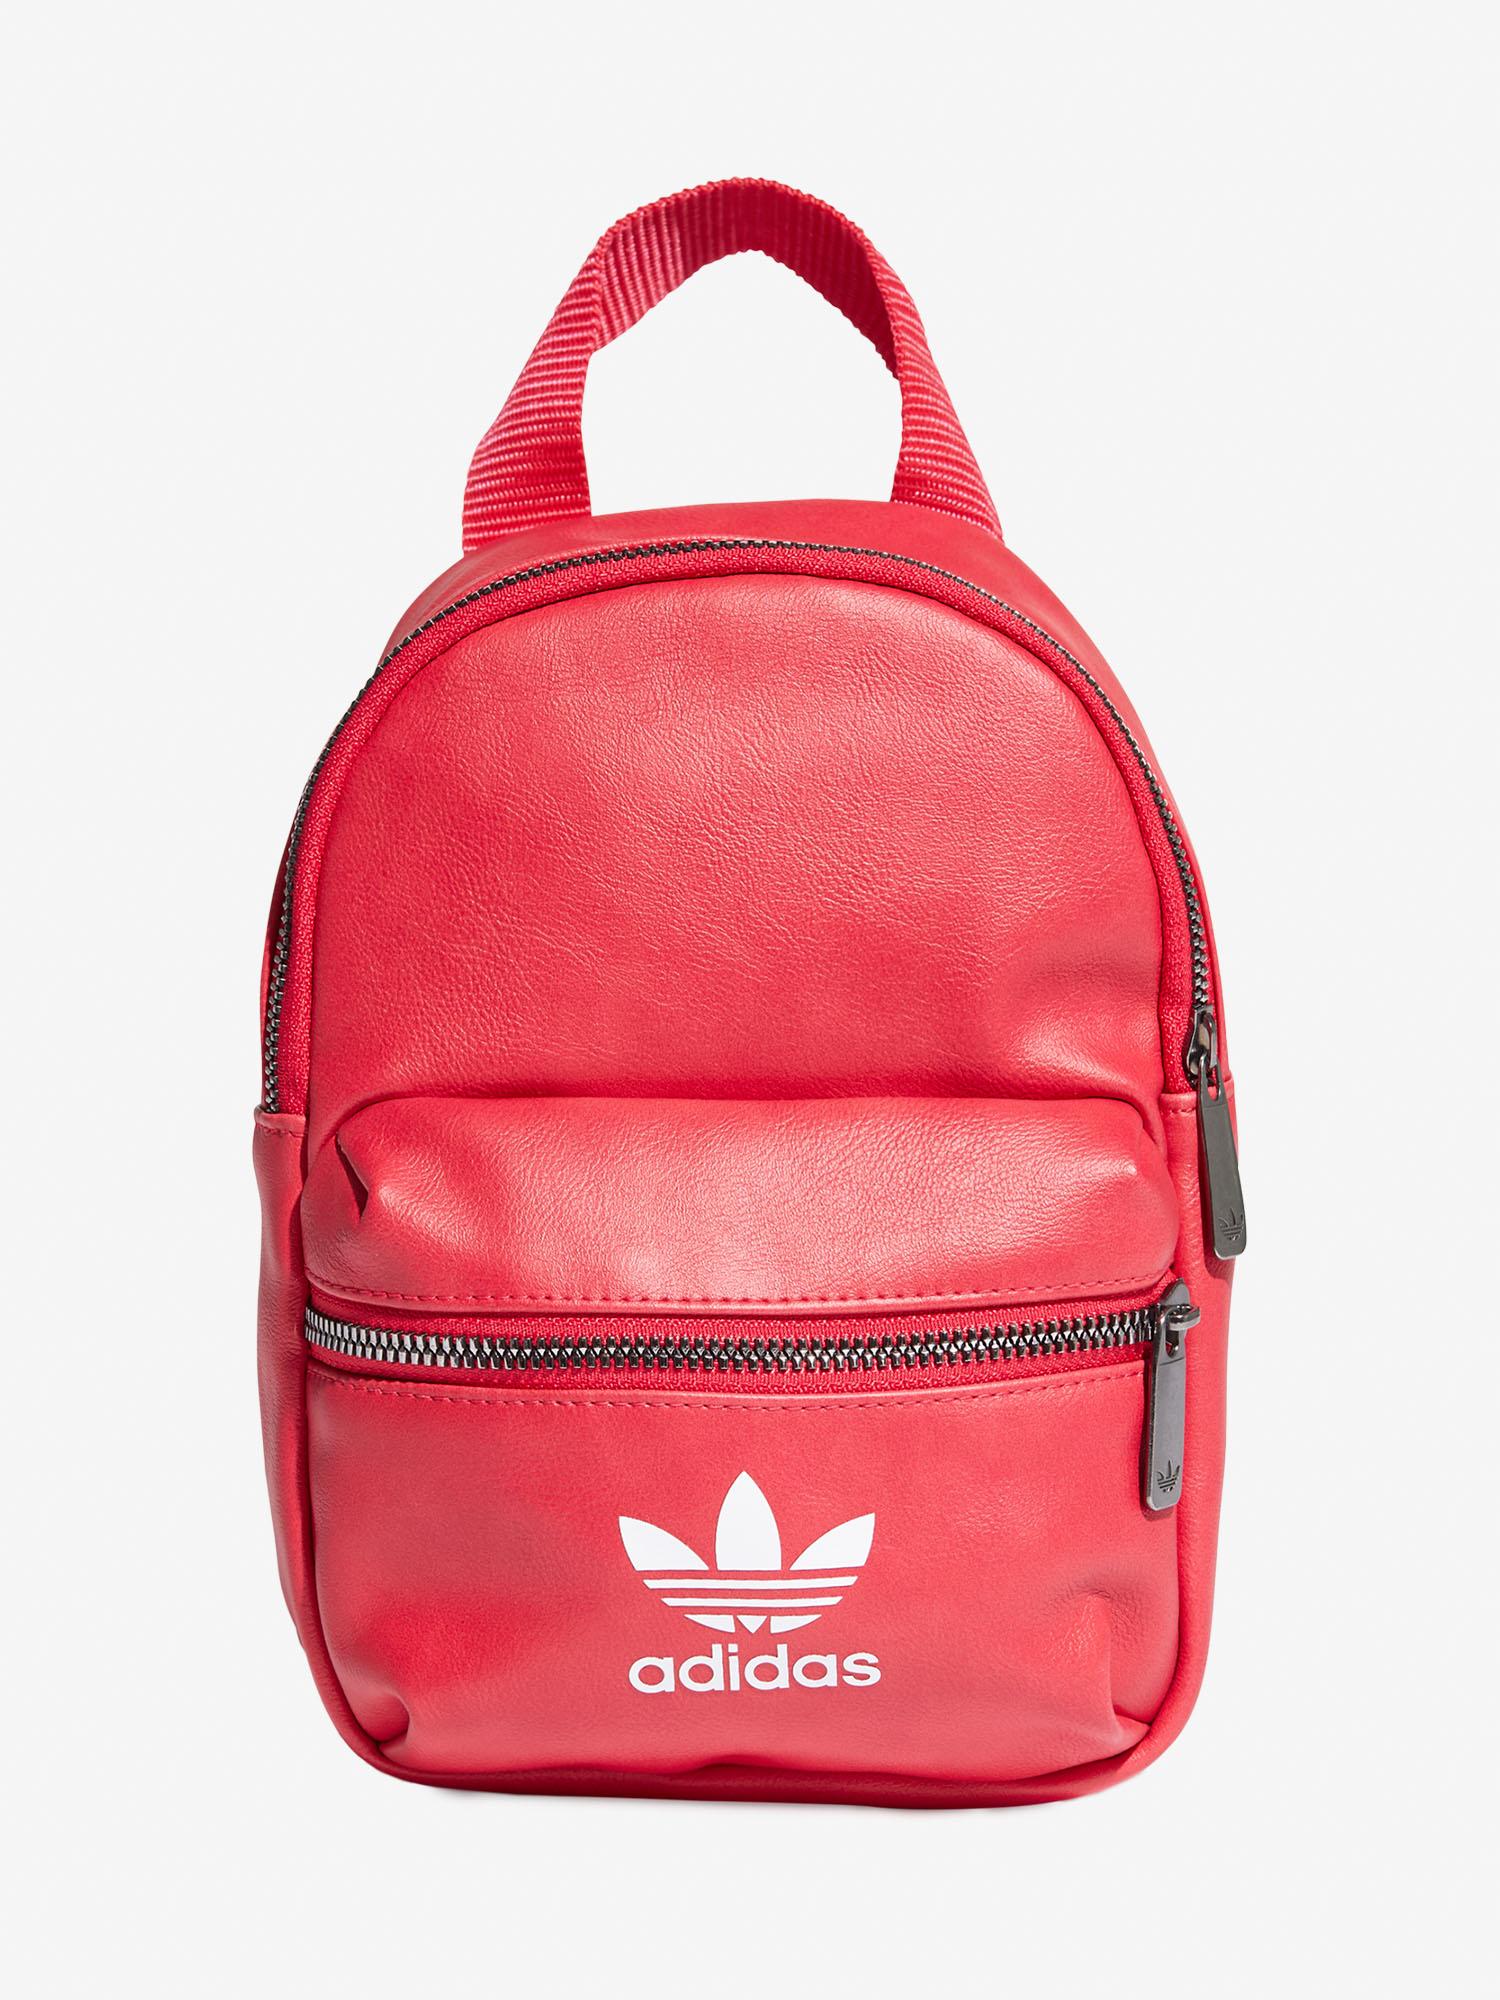 Adidas Originals Bp Mini Pu Backpack